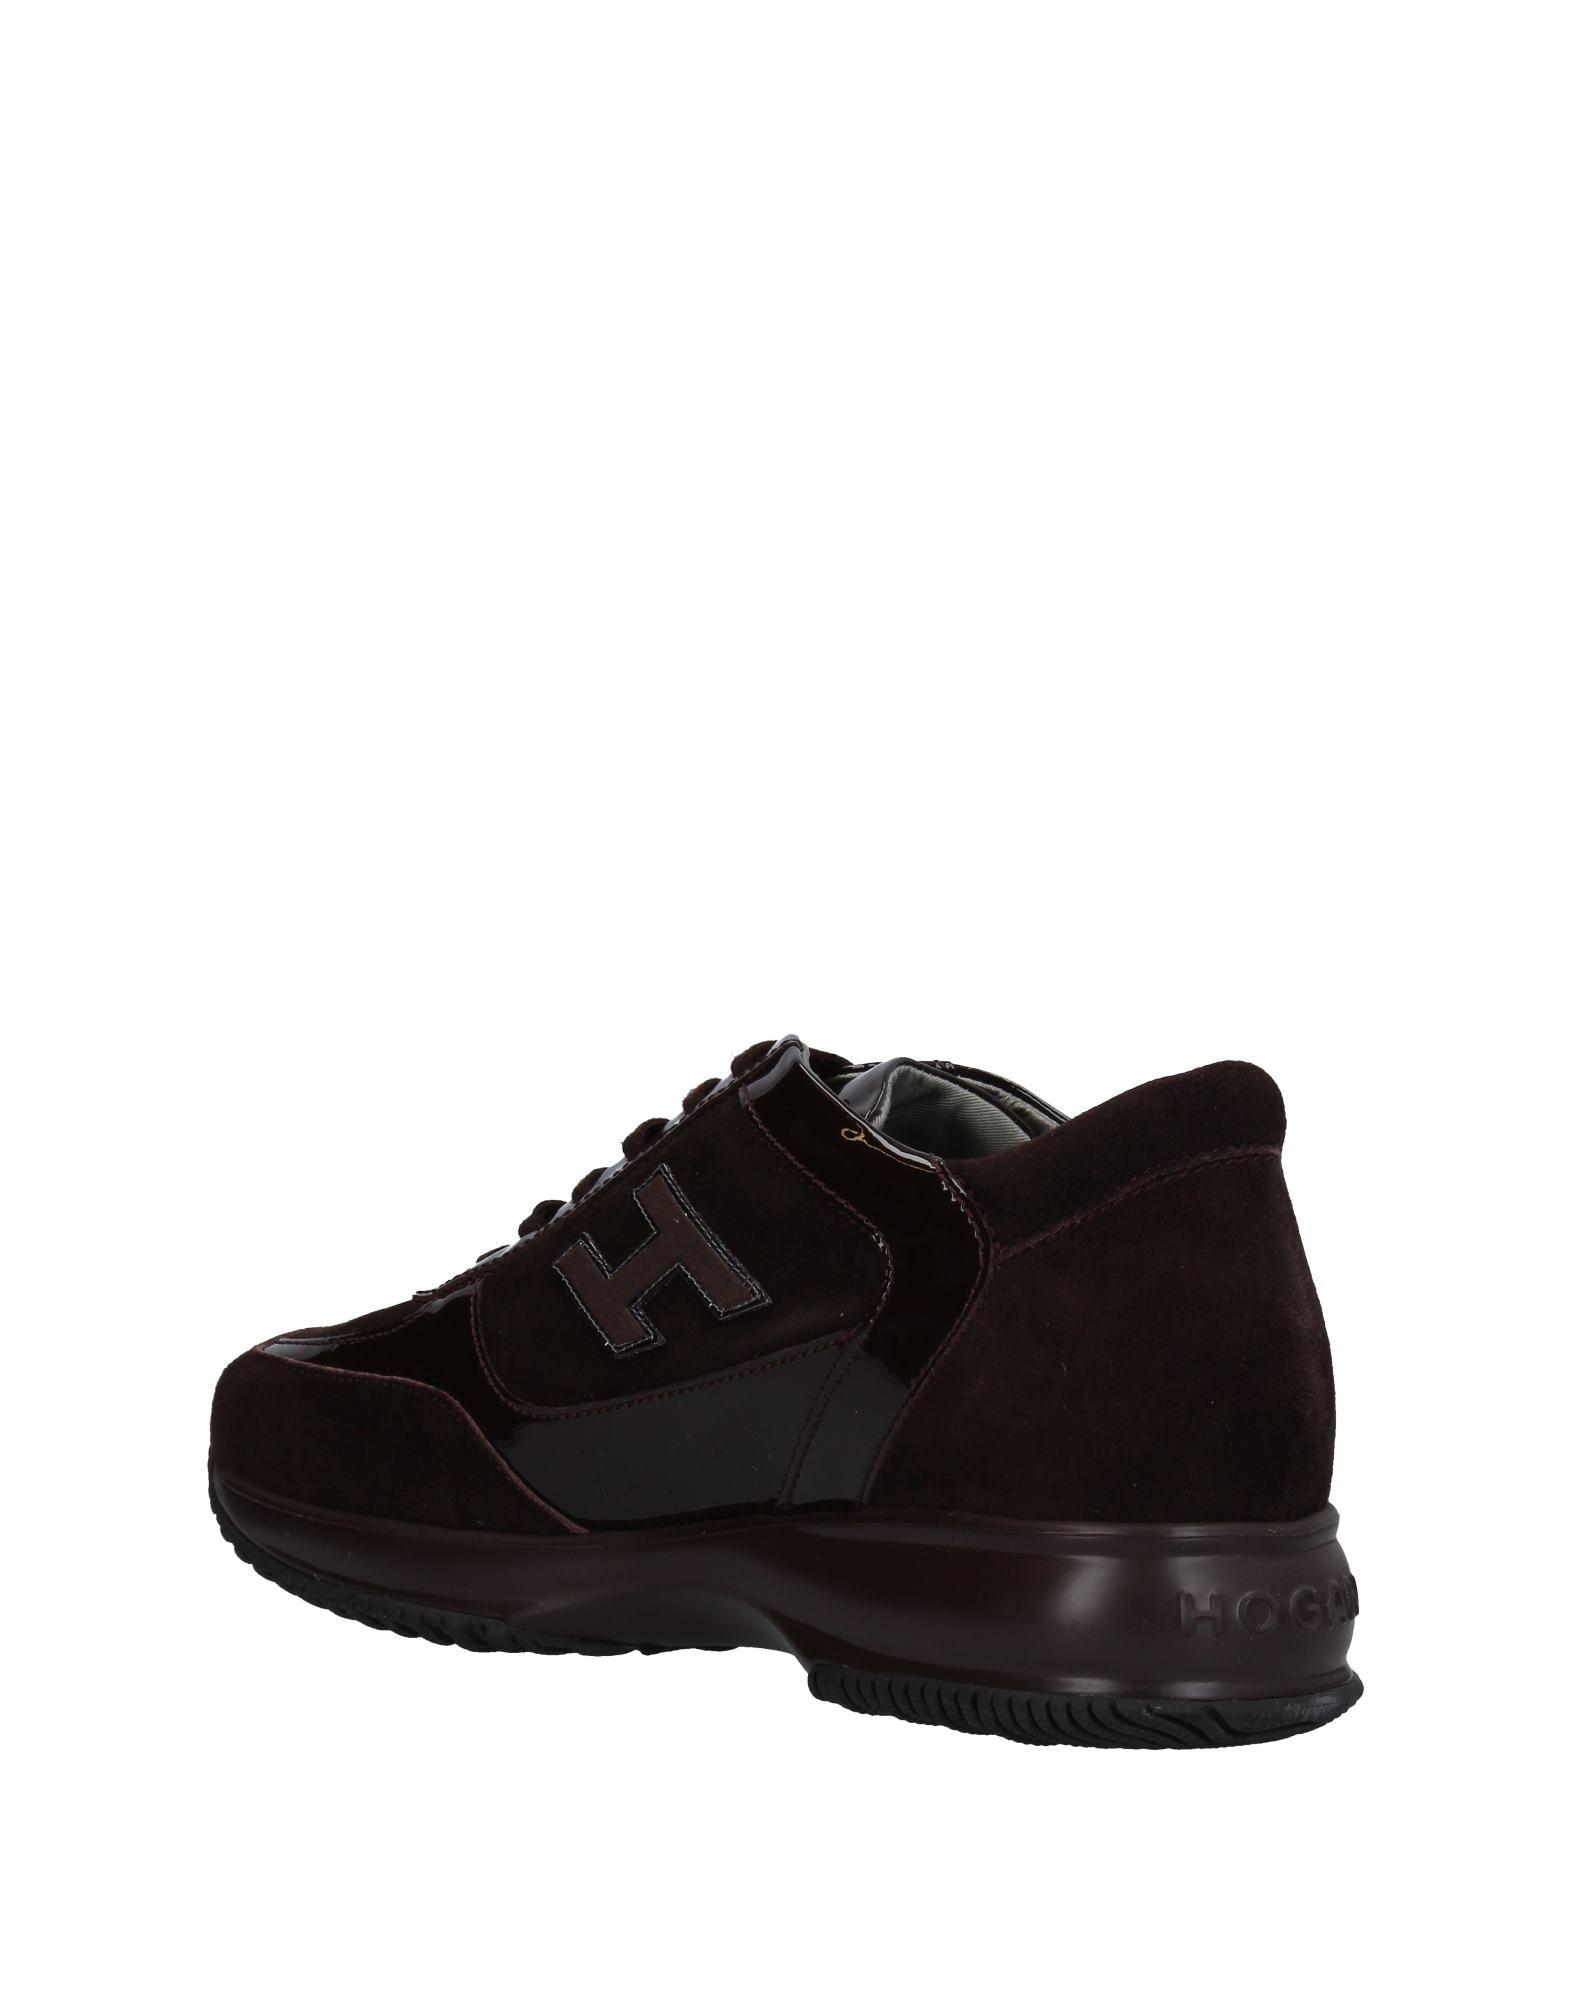 Hogan Sneakers - Women Hogan Hogan Hogan Sneakers online on  United Kingdom - 11292408BP d61ff9